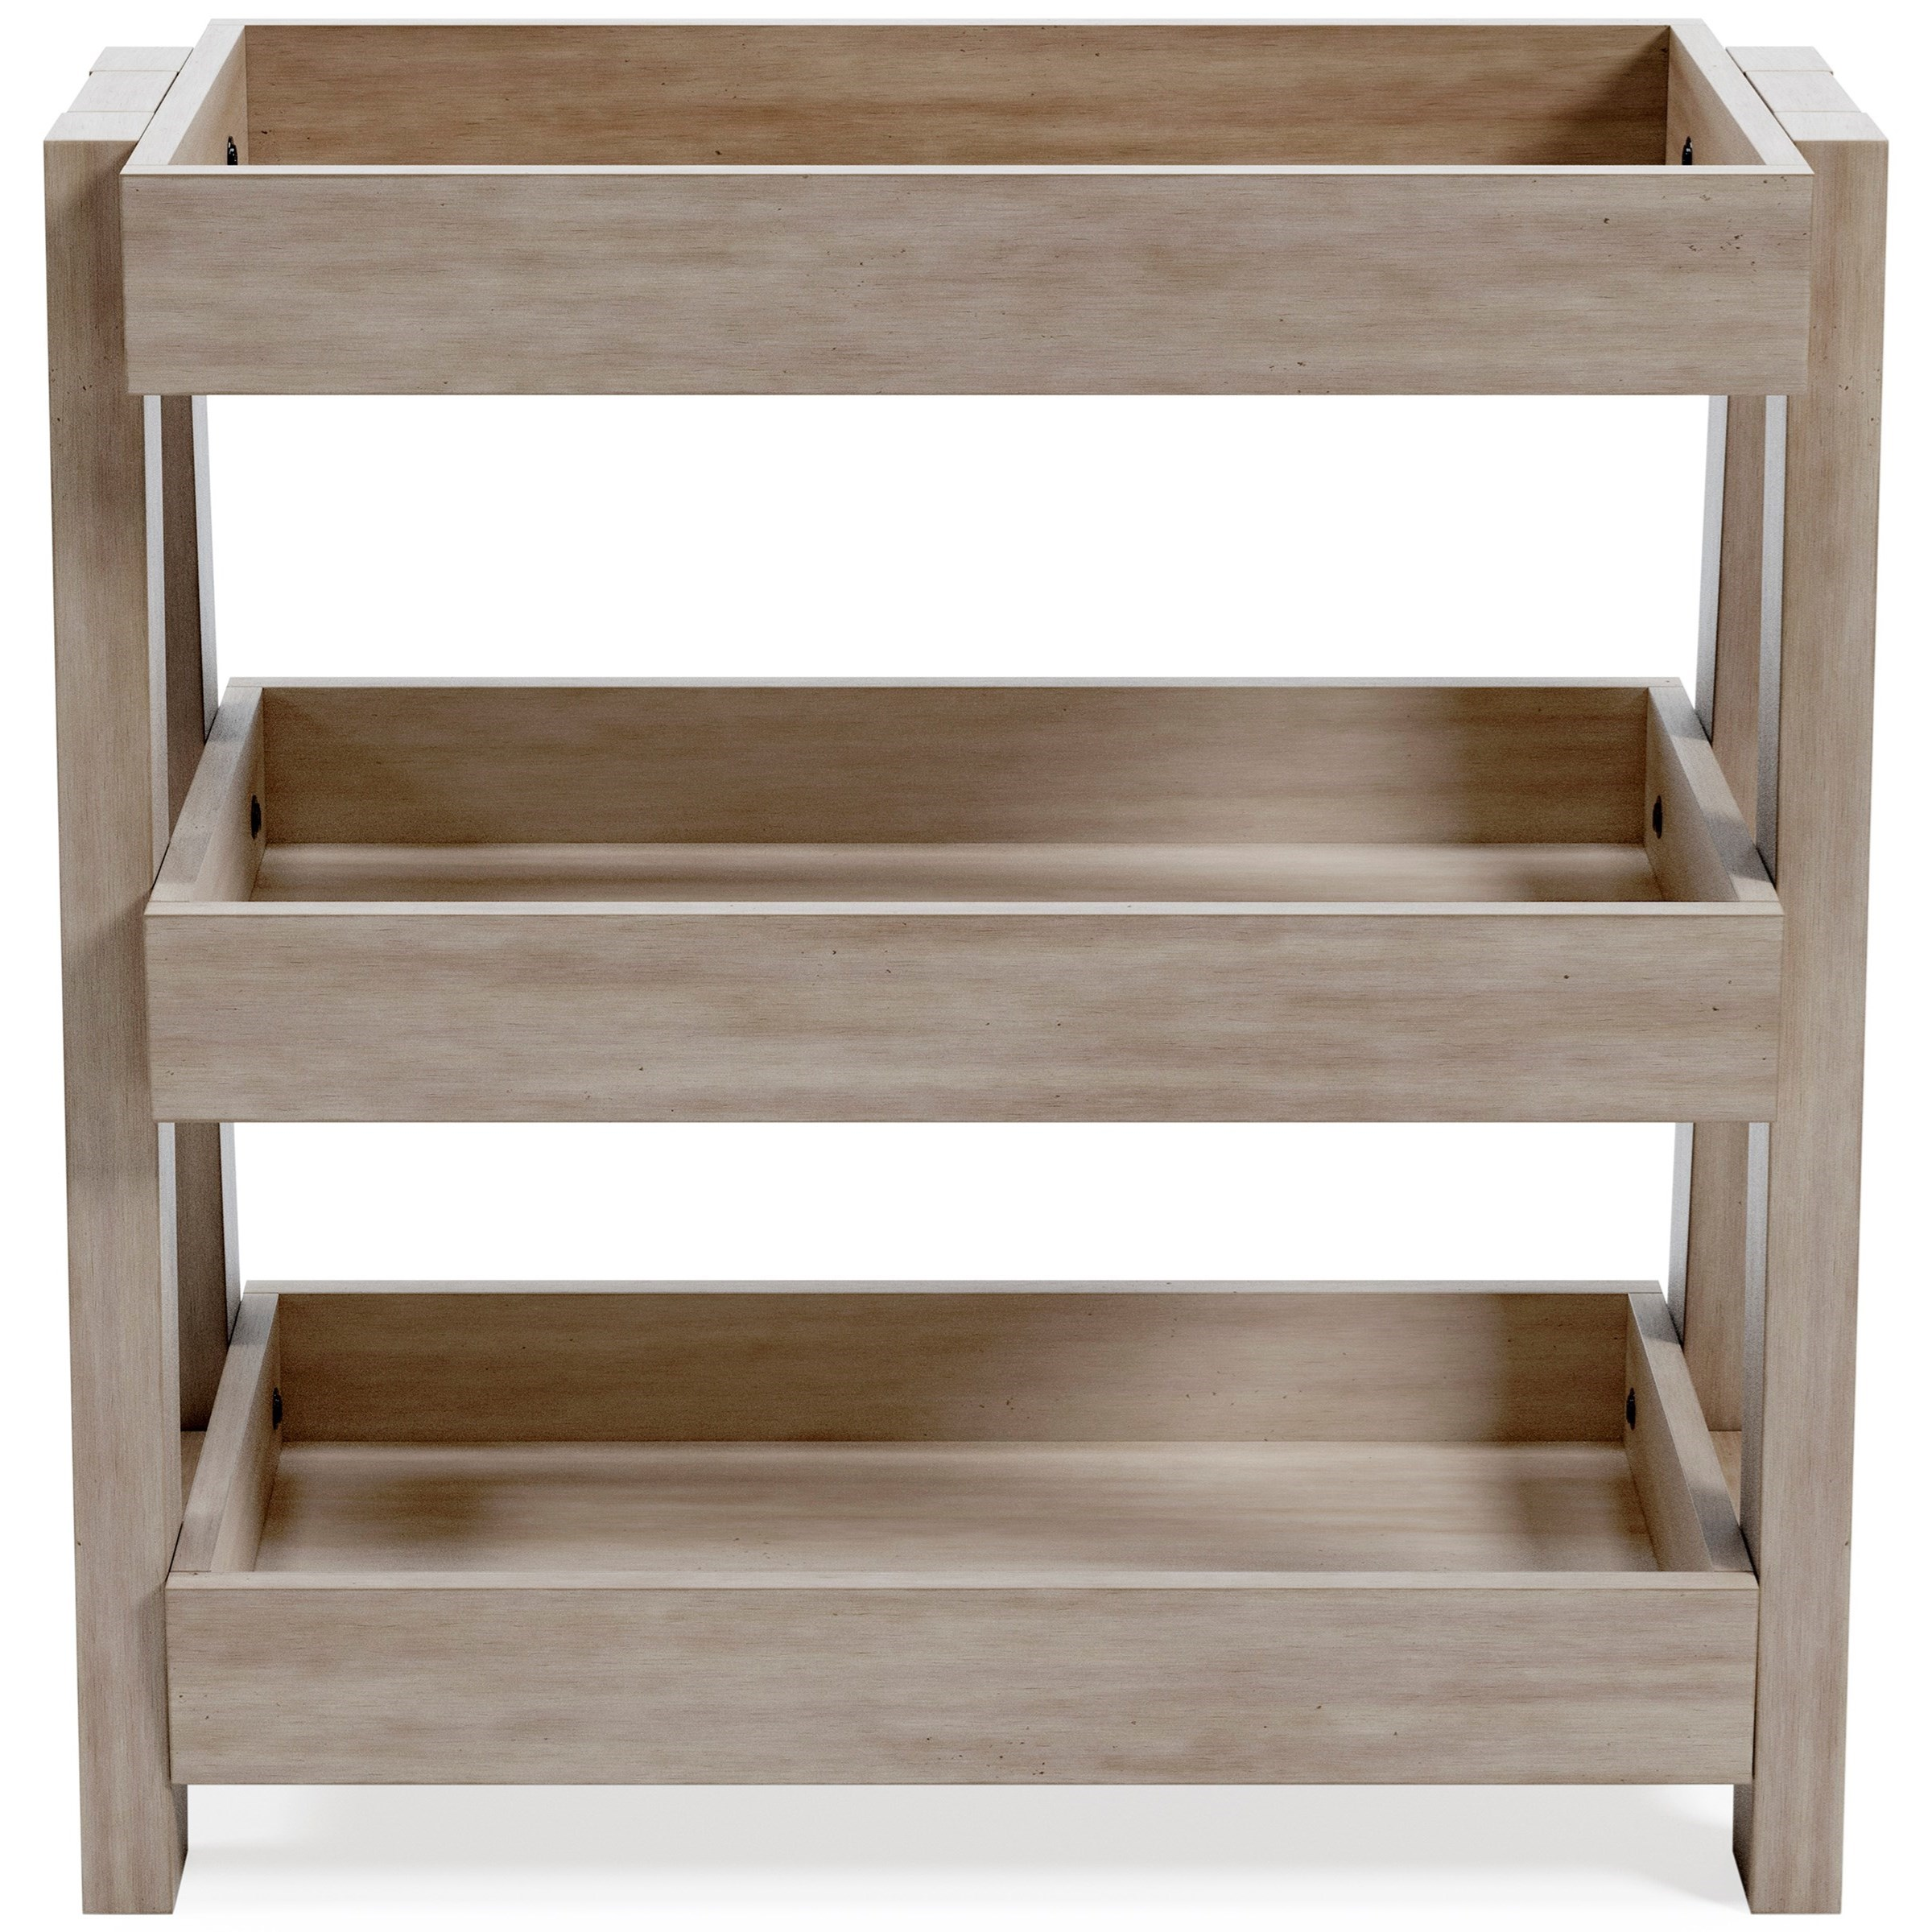 Blariden Shelf Accent Table by Ashley (Signature Design) at Johnny Janosik